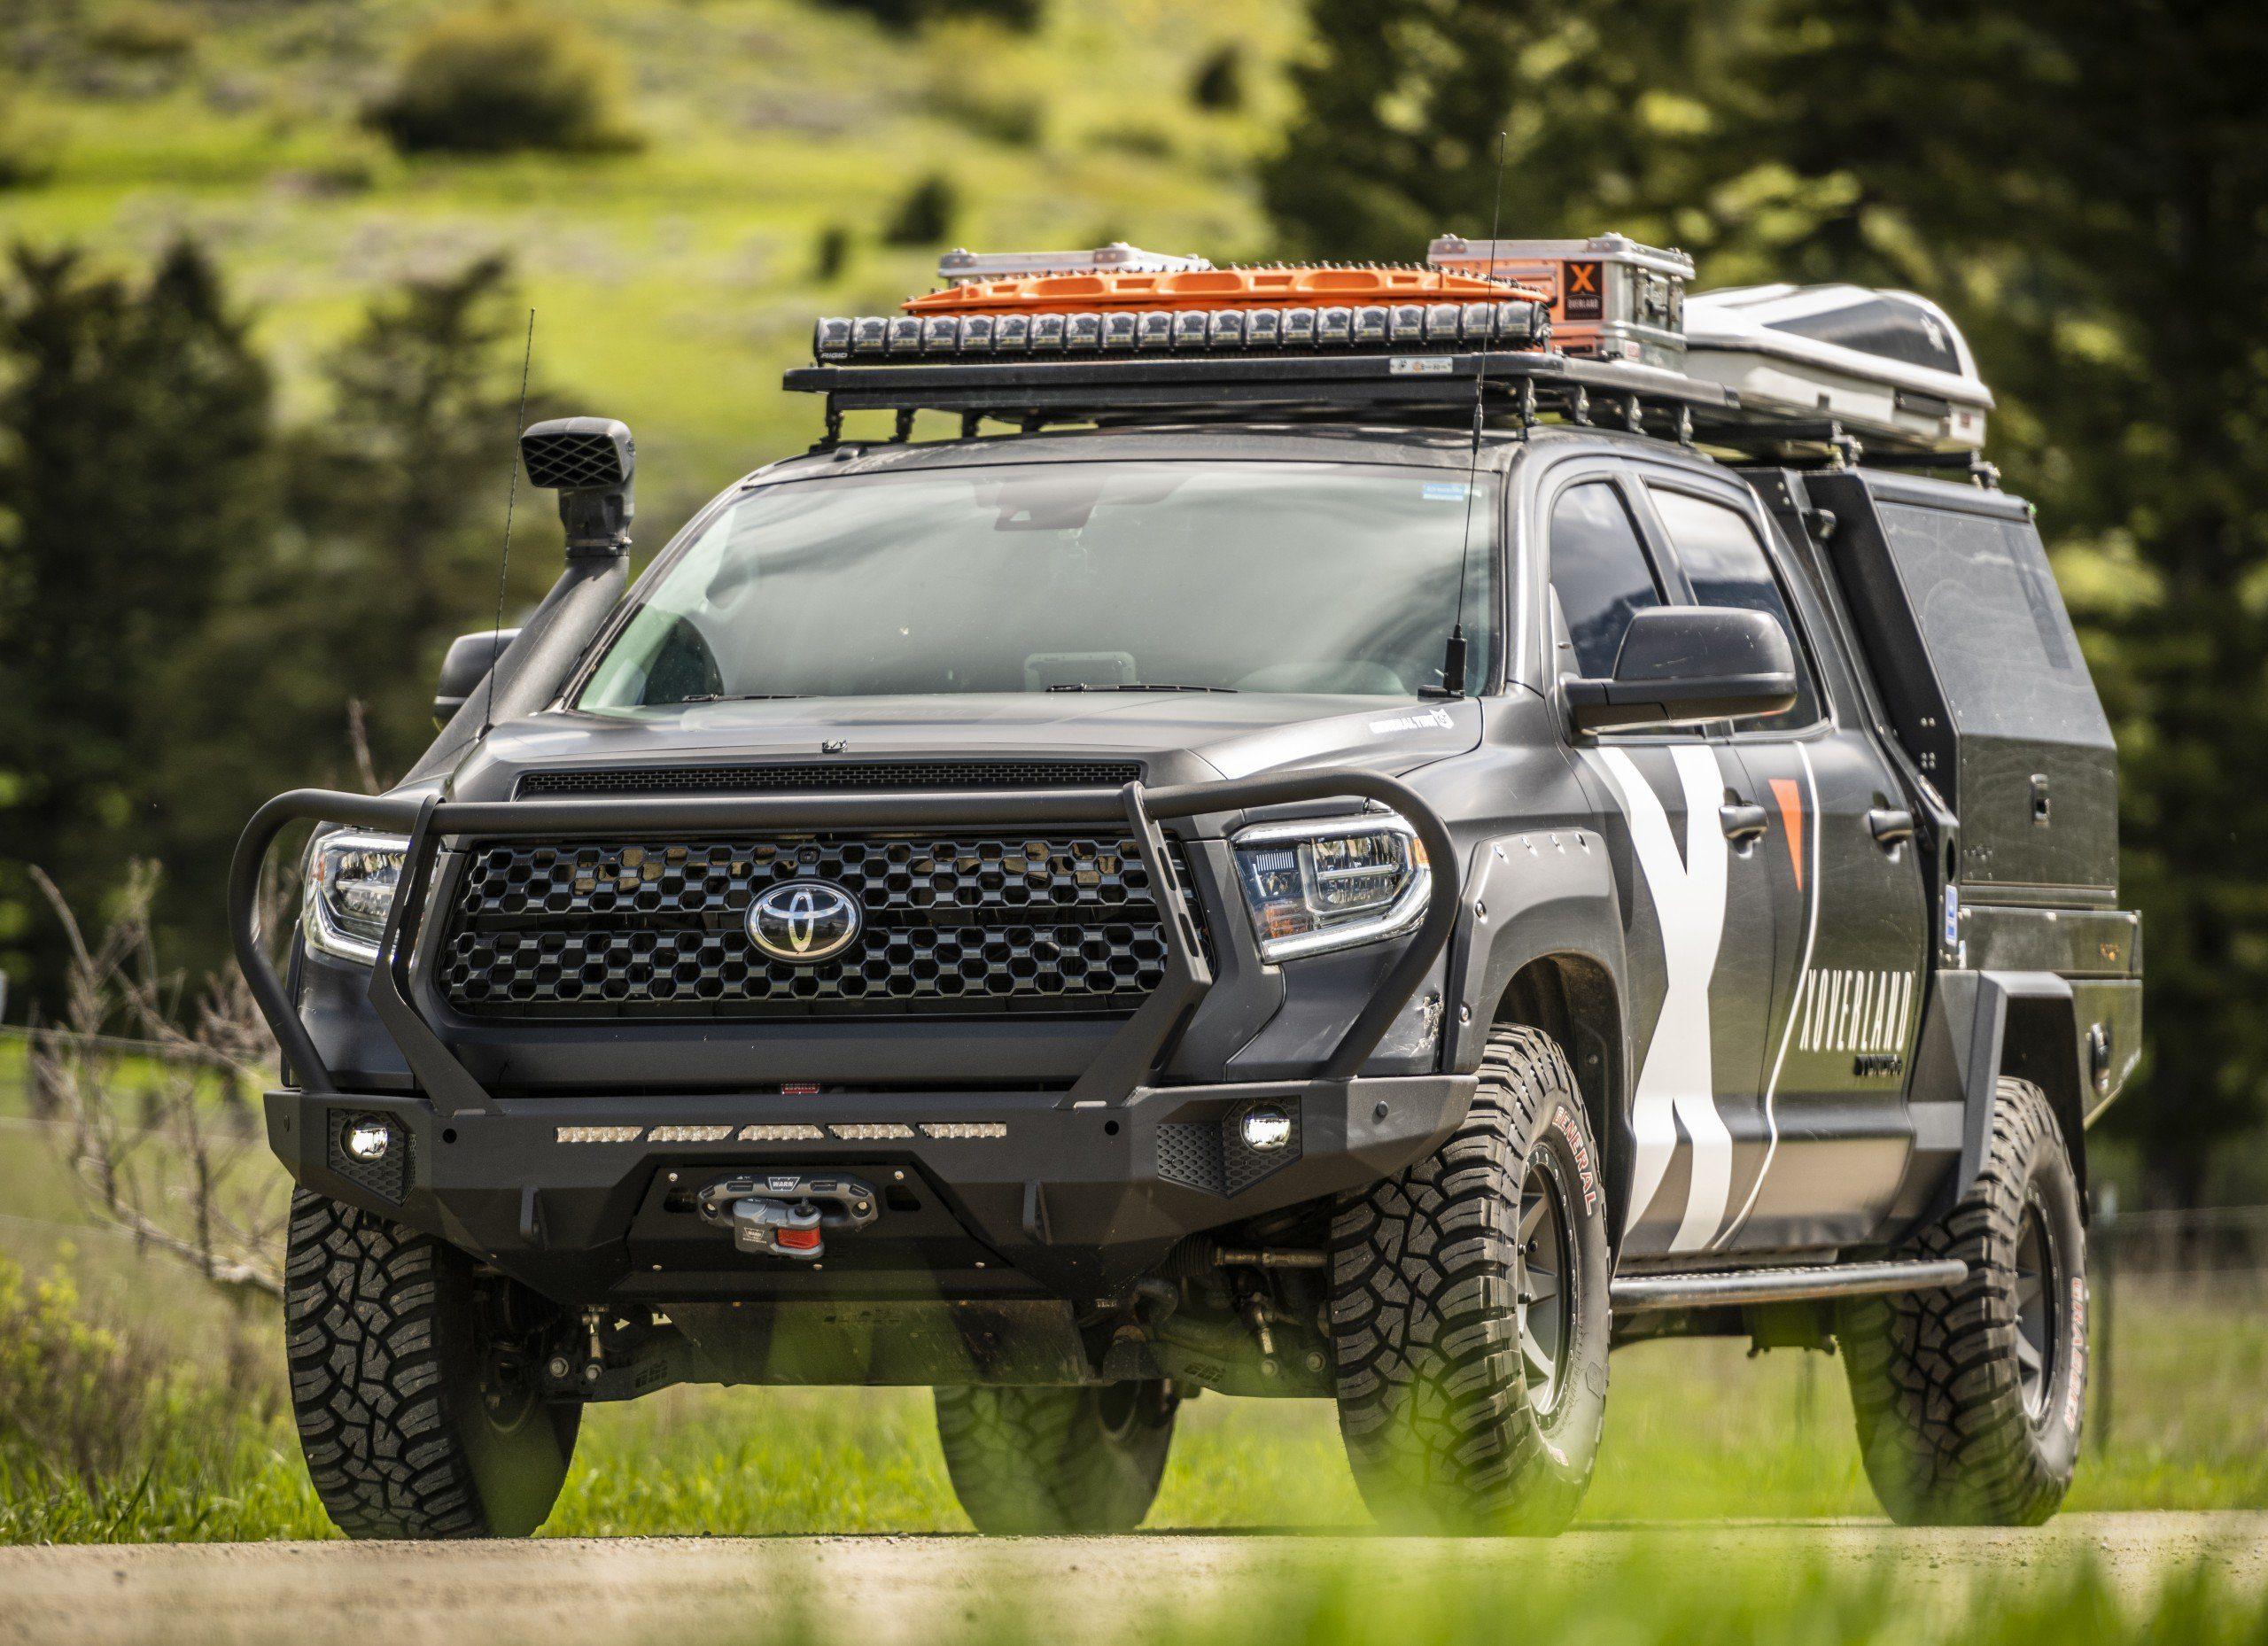 2018 Toyota Tundra Crewmax Expedition Overland